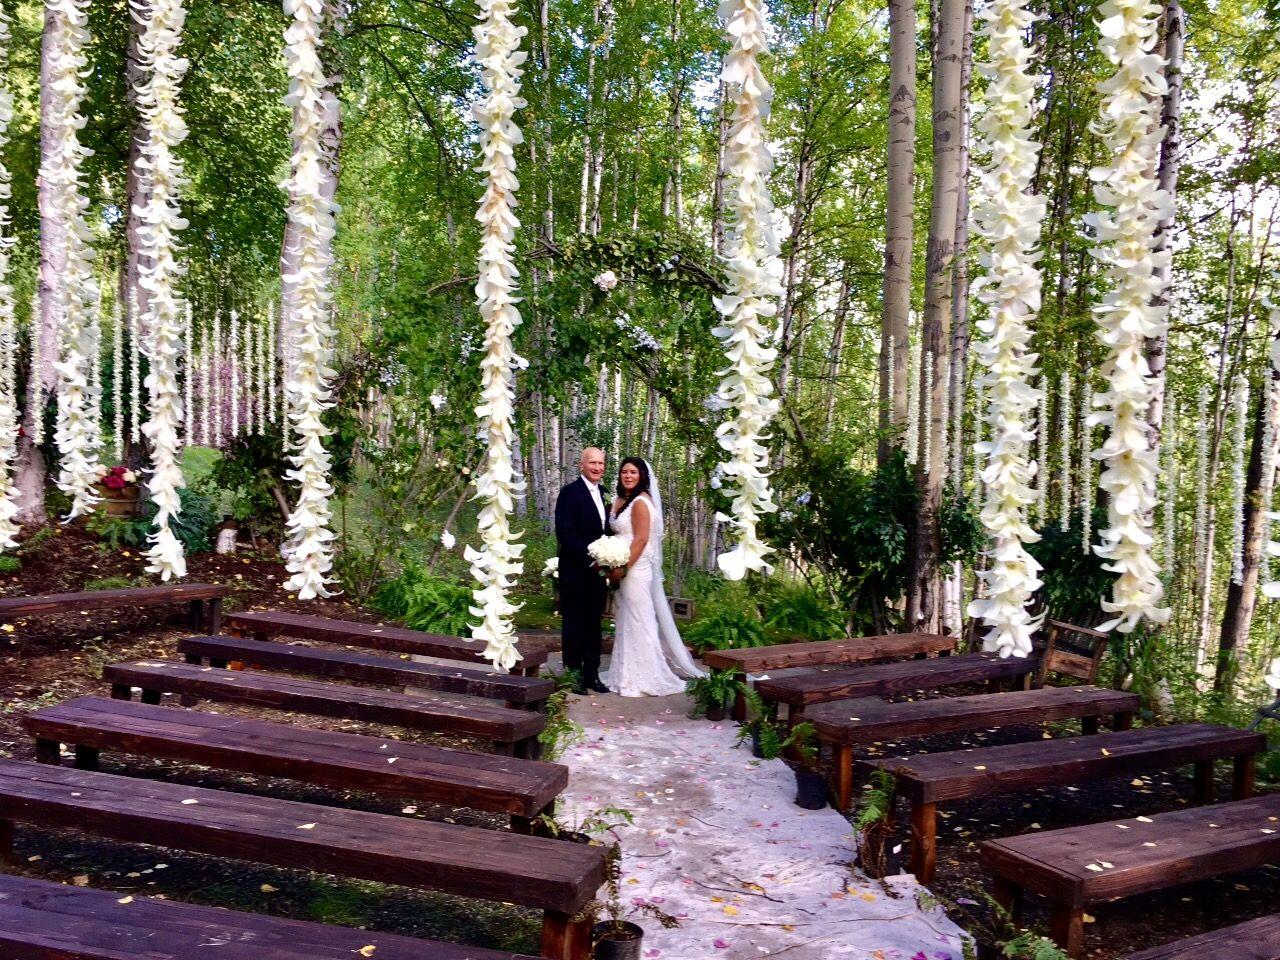 Wedding Benches Wedding Bench Outdoor Wedding Decorations Diy Wedding Benches